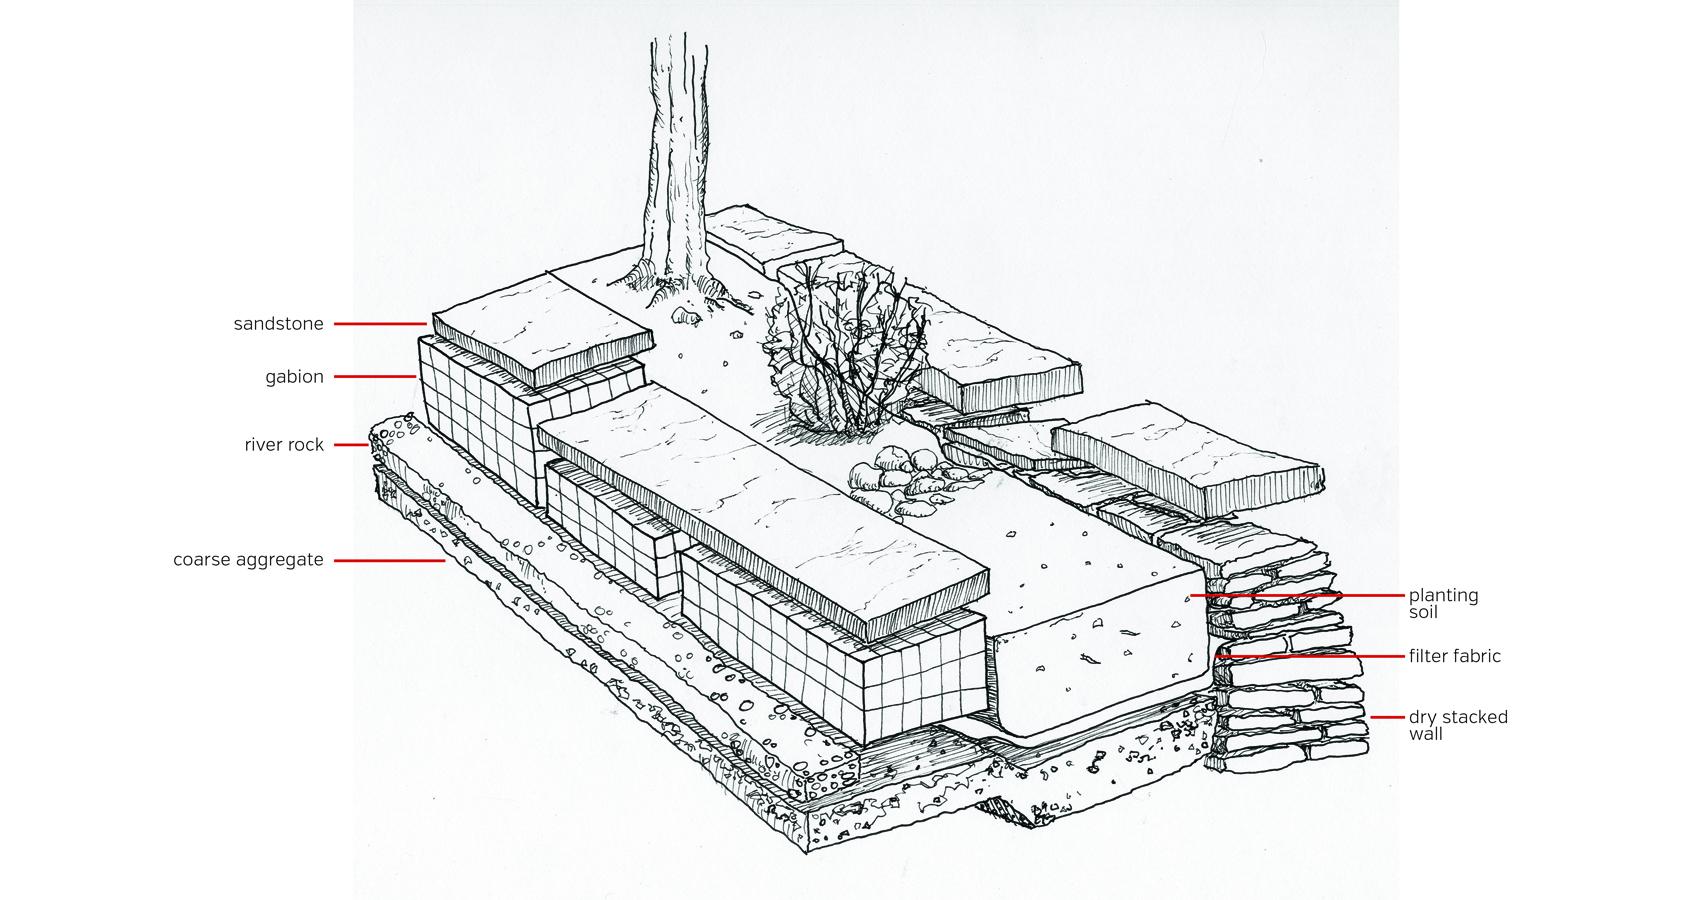 Detailing: Check Dam Seat Wall — Richard Fisher